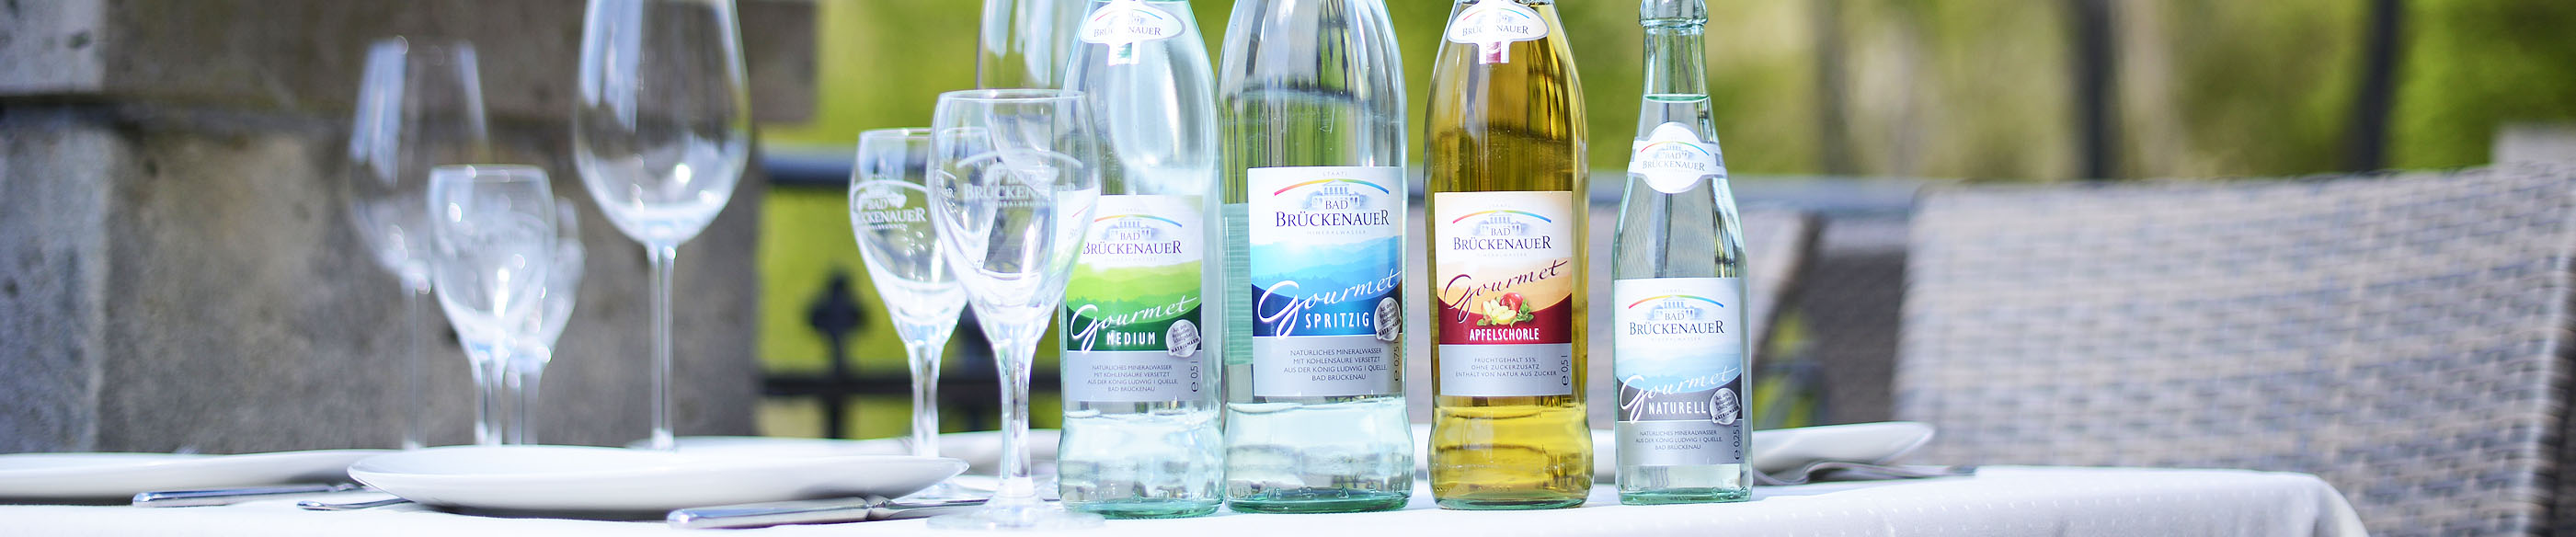 Bad Brückenauer Gourmet